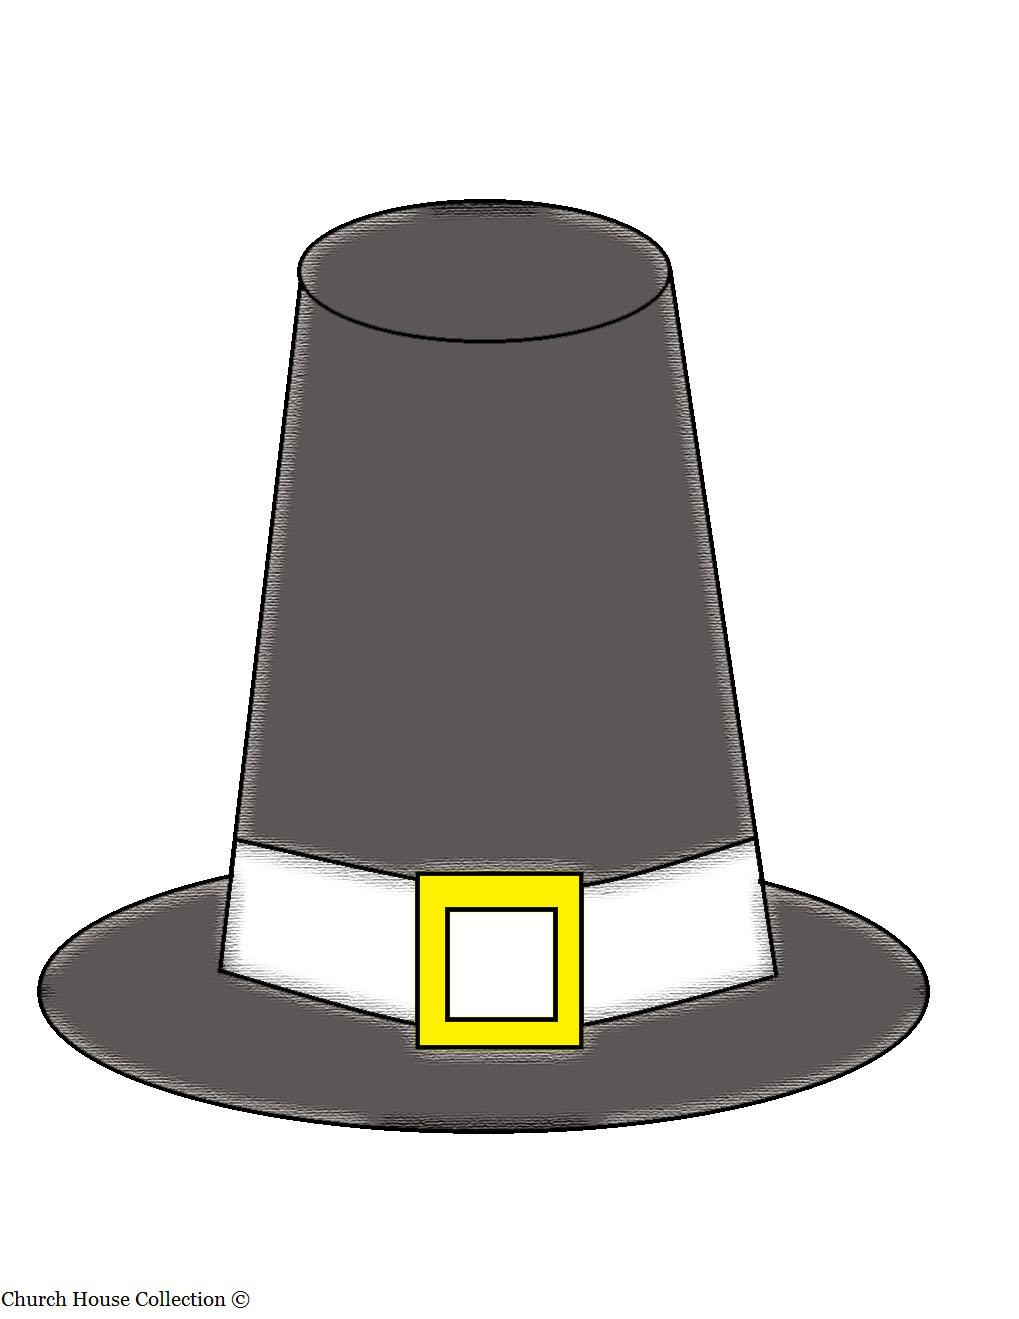 church house collection blog free printable pilgrim pilgrim hat clipart free pilgrim bonnet clipart